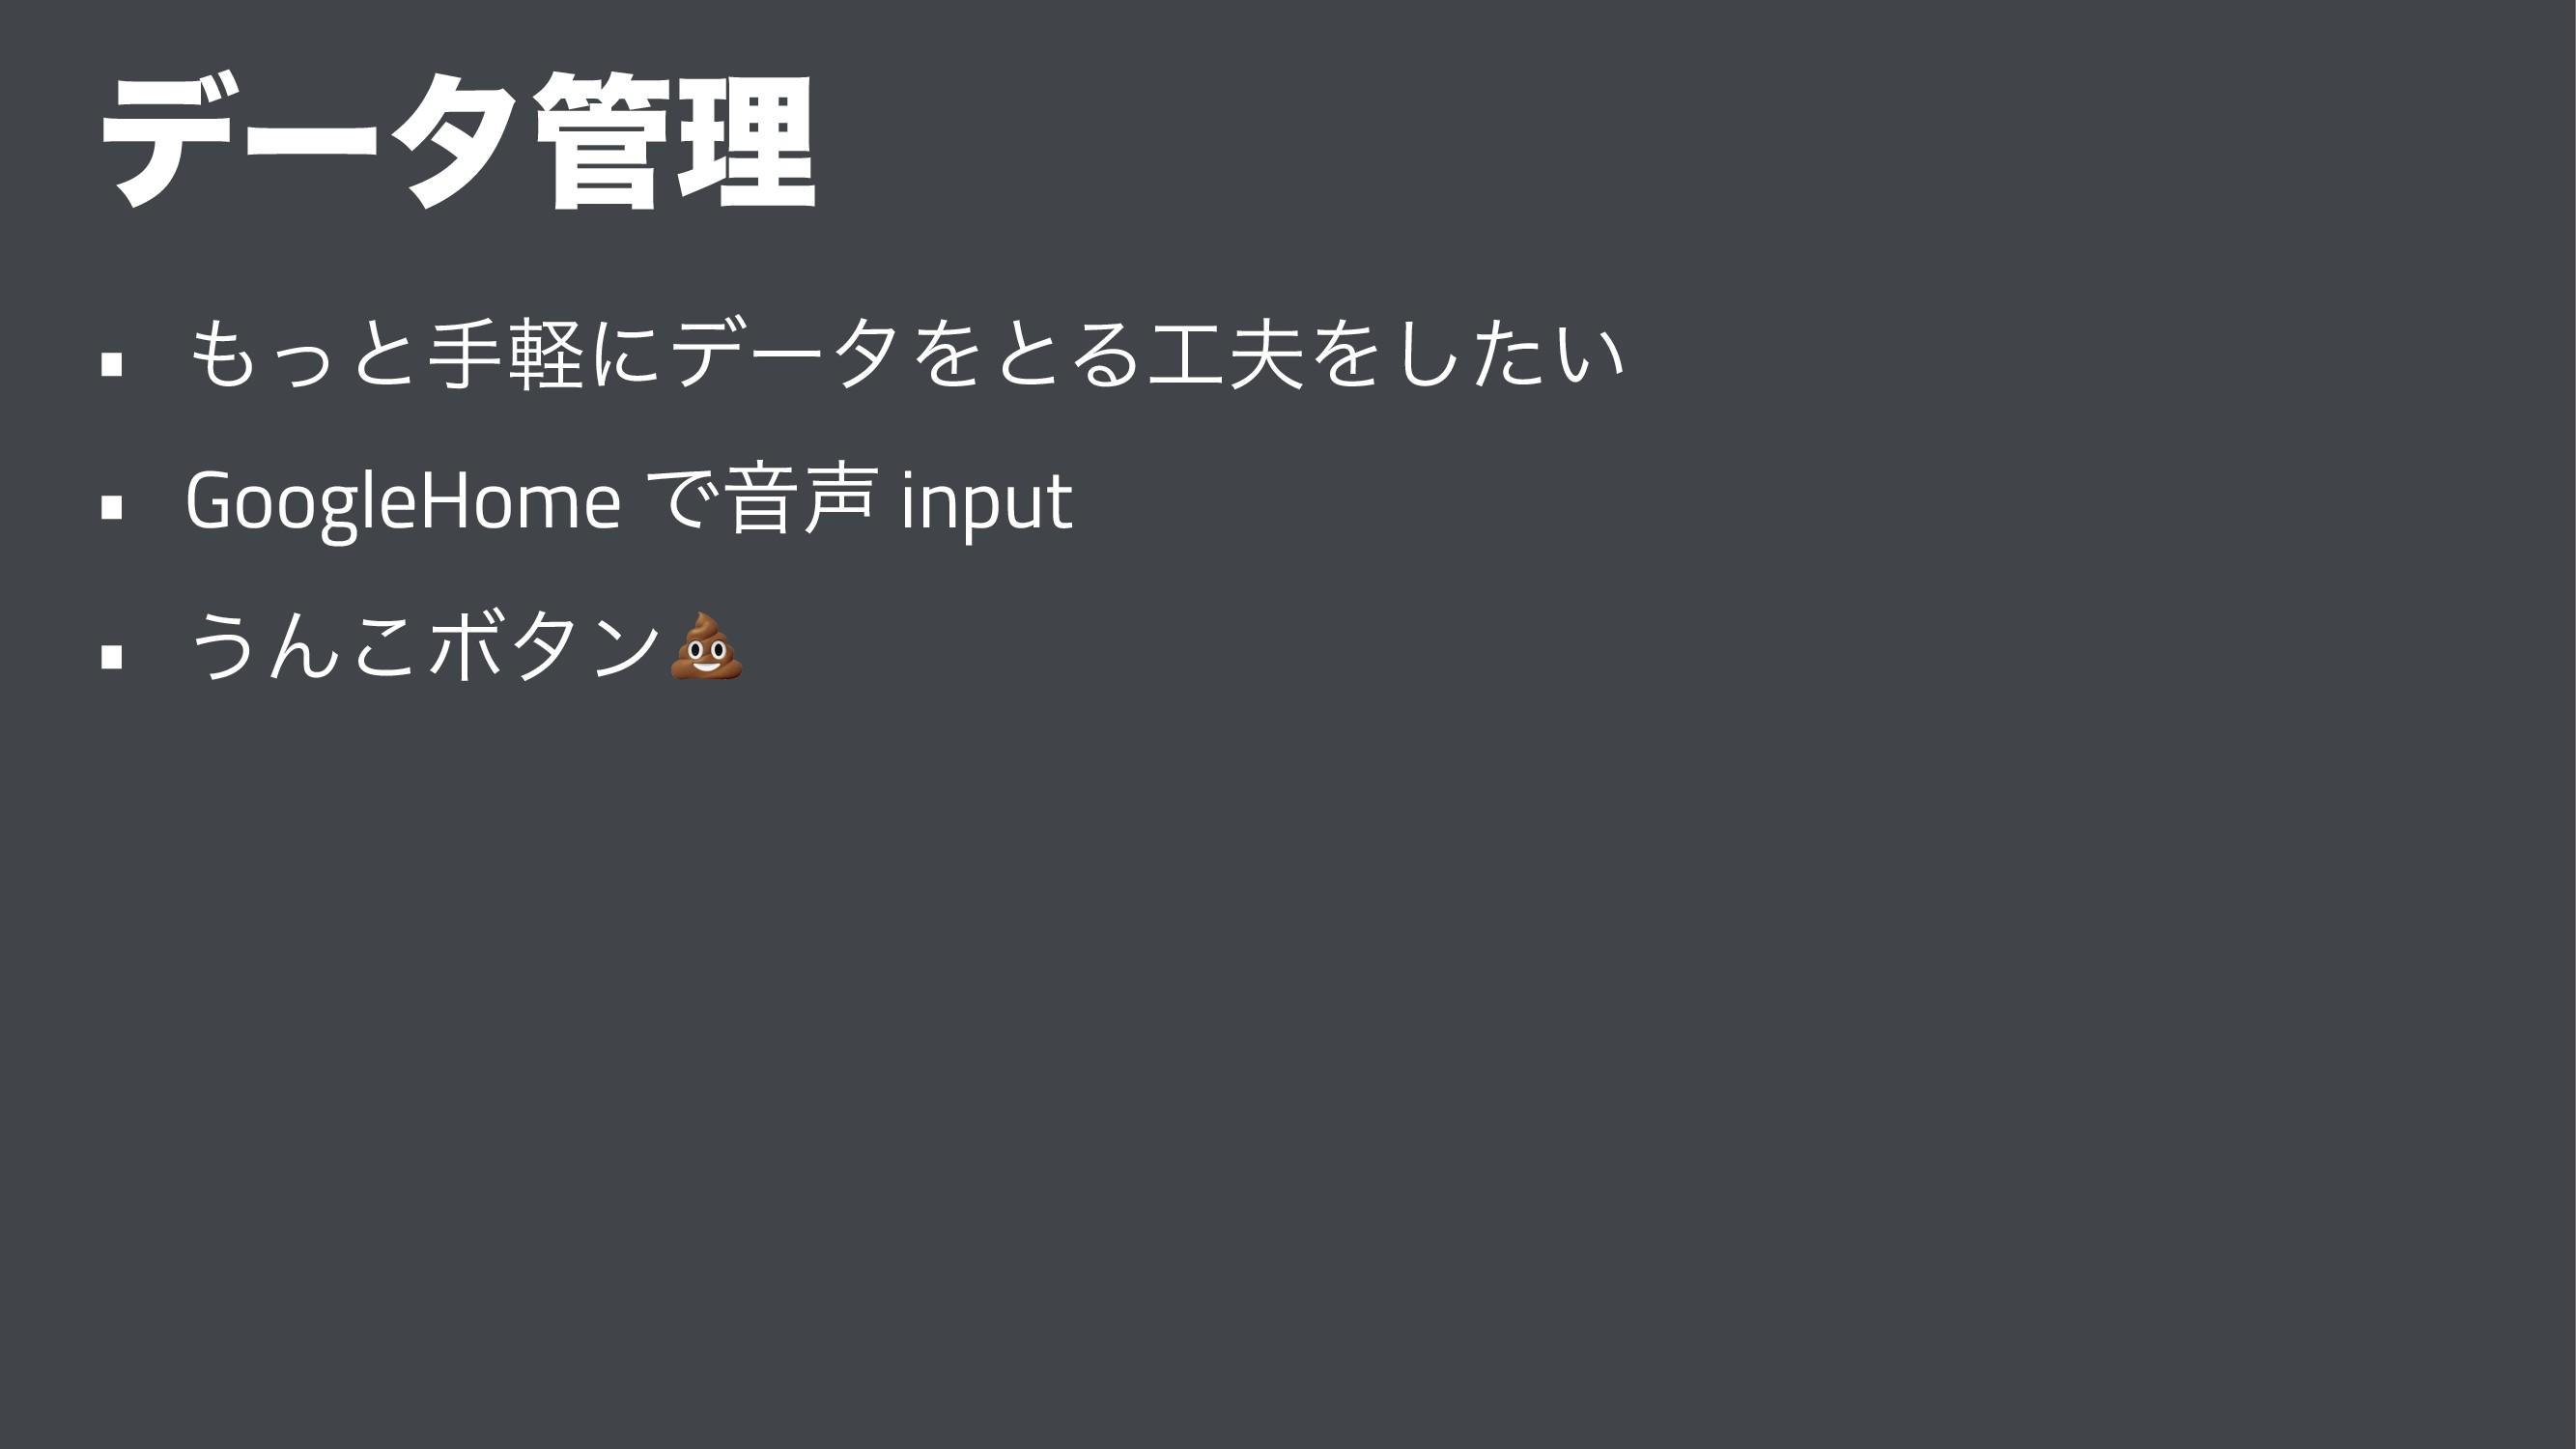 σʔλཧ • ͬͱखܰʹσʔλΛͱΔΛ͍ͨ͠ • GoogleHome ͰԻ inp...